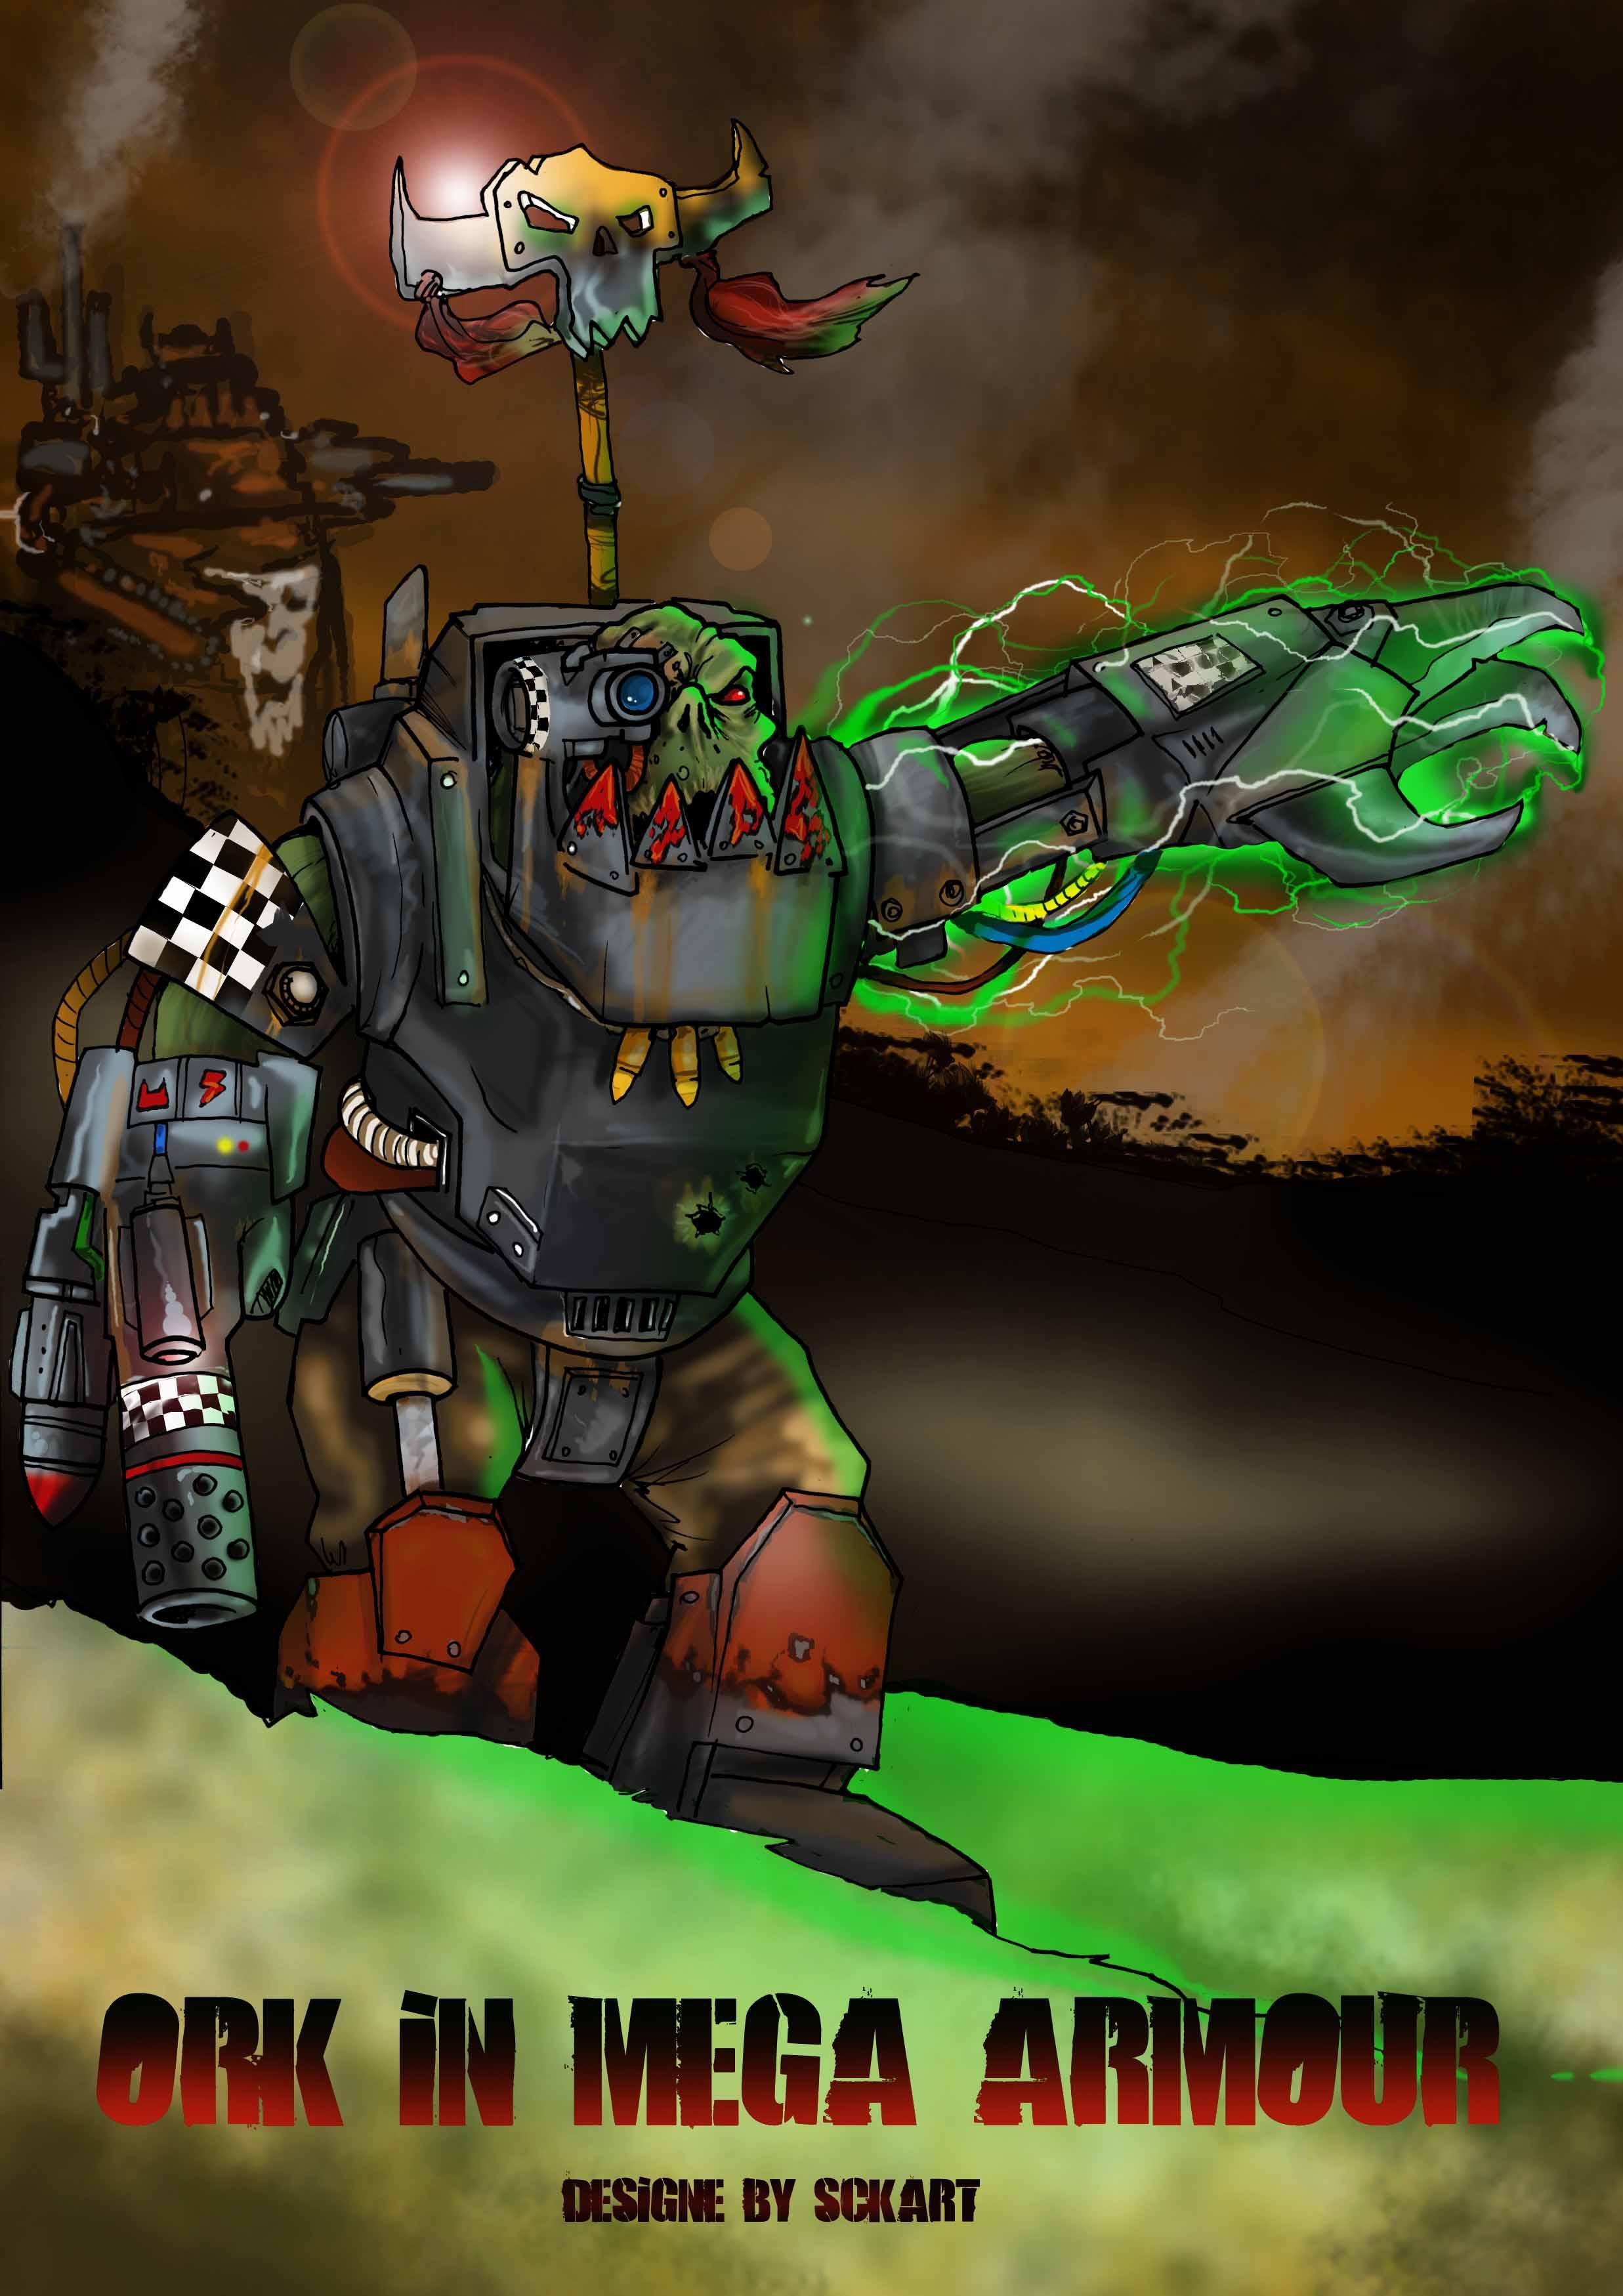 Artwork-ork, mega armour